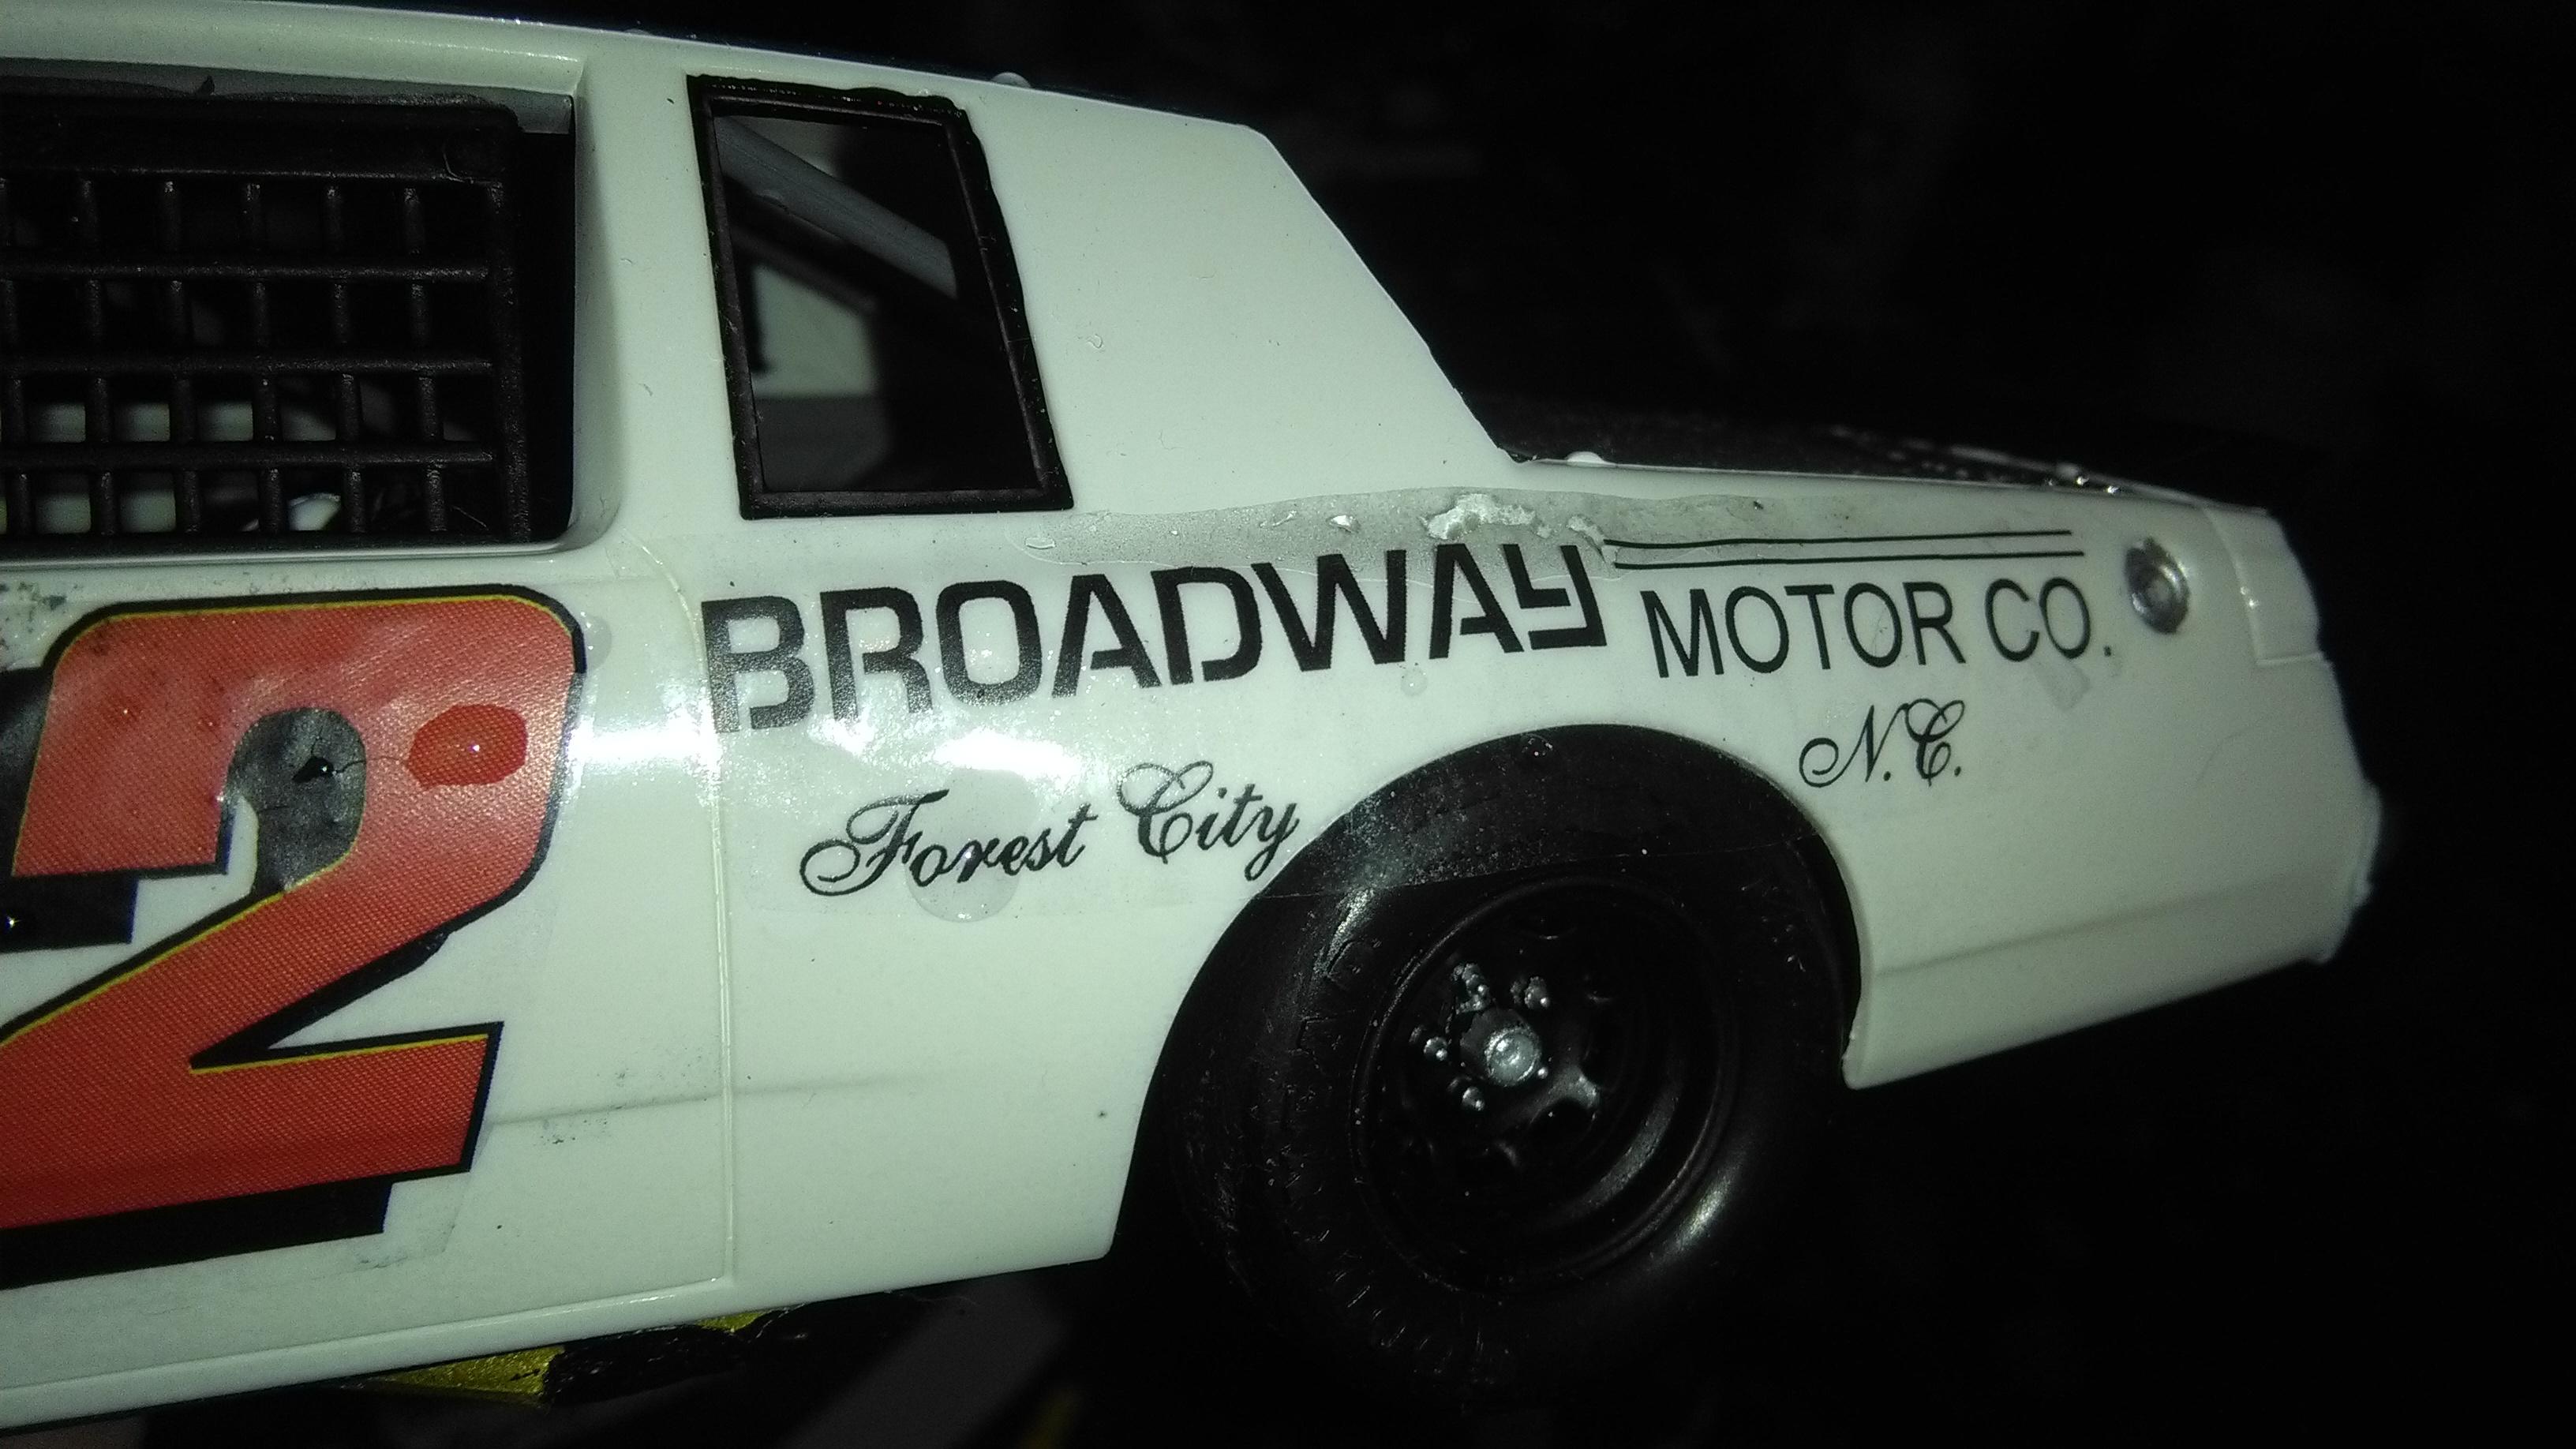 Buick Regal 1982 #52 Jimmy Means Broadway motor  597363B19815220